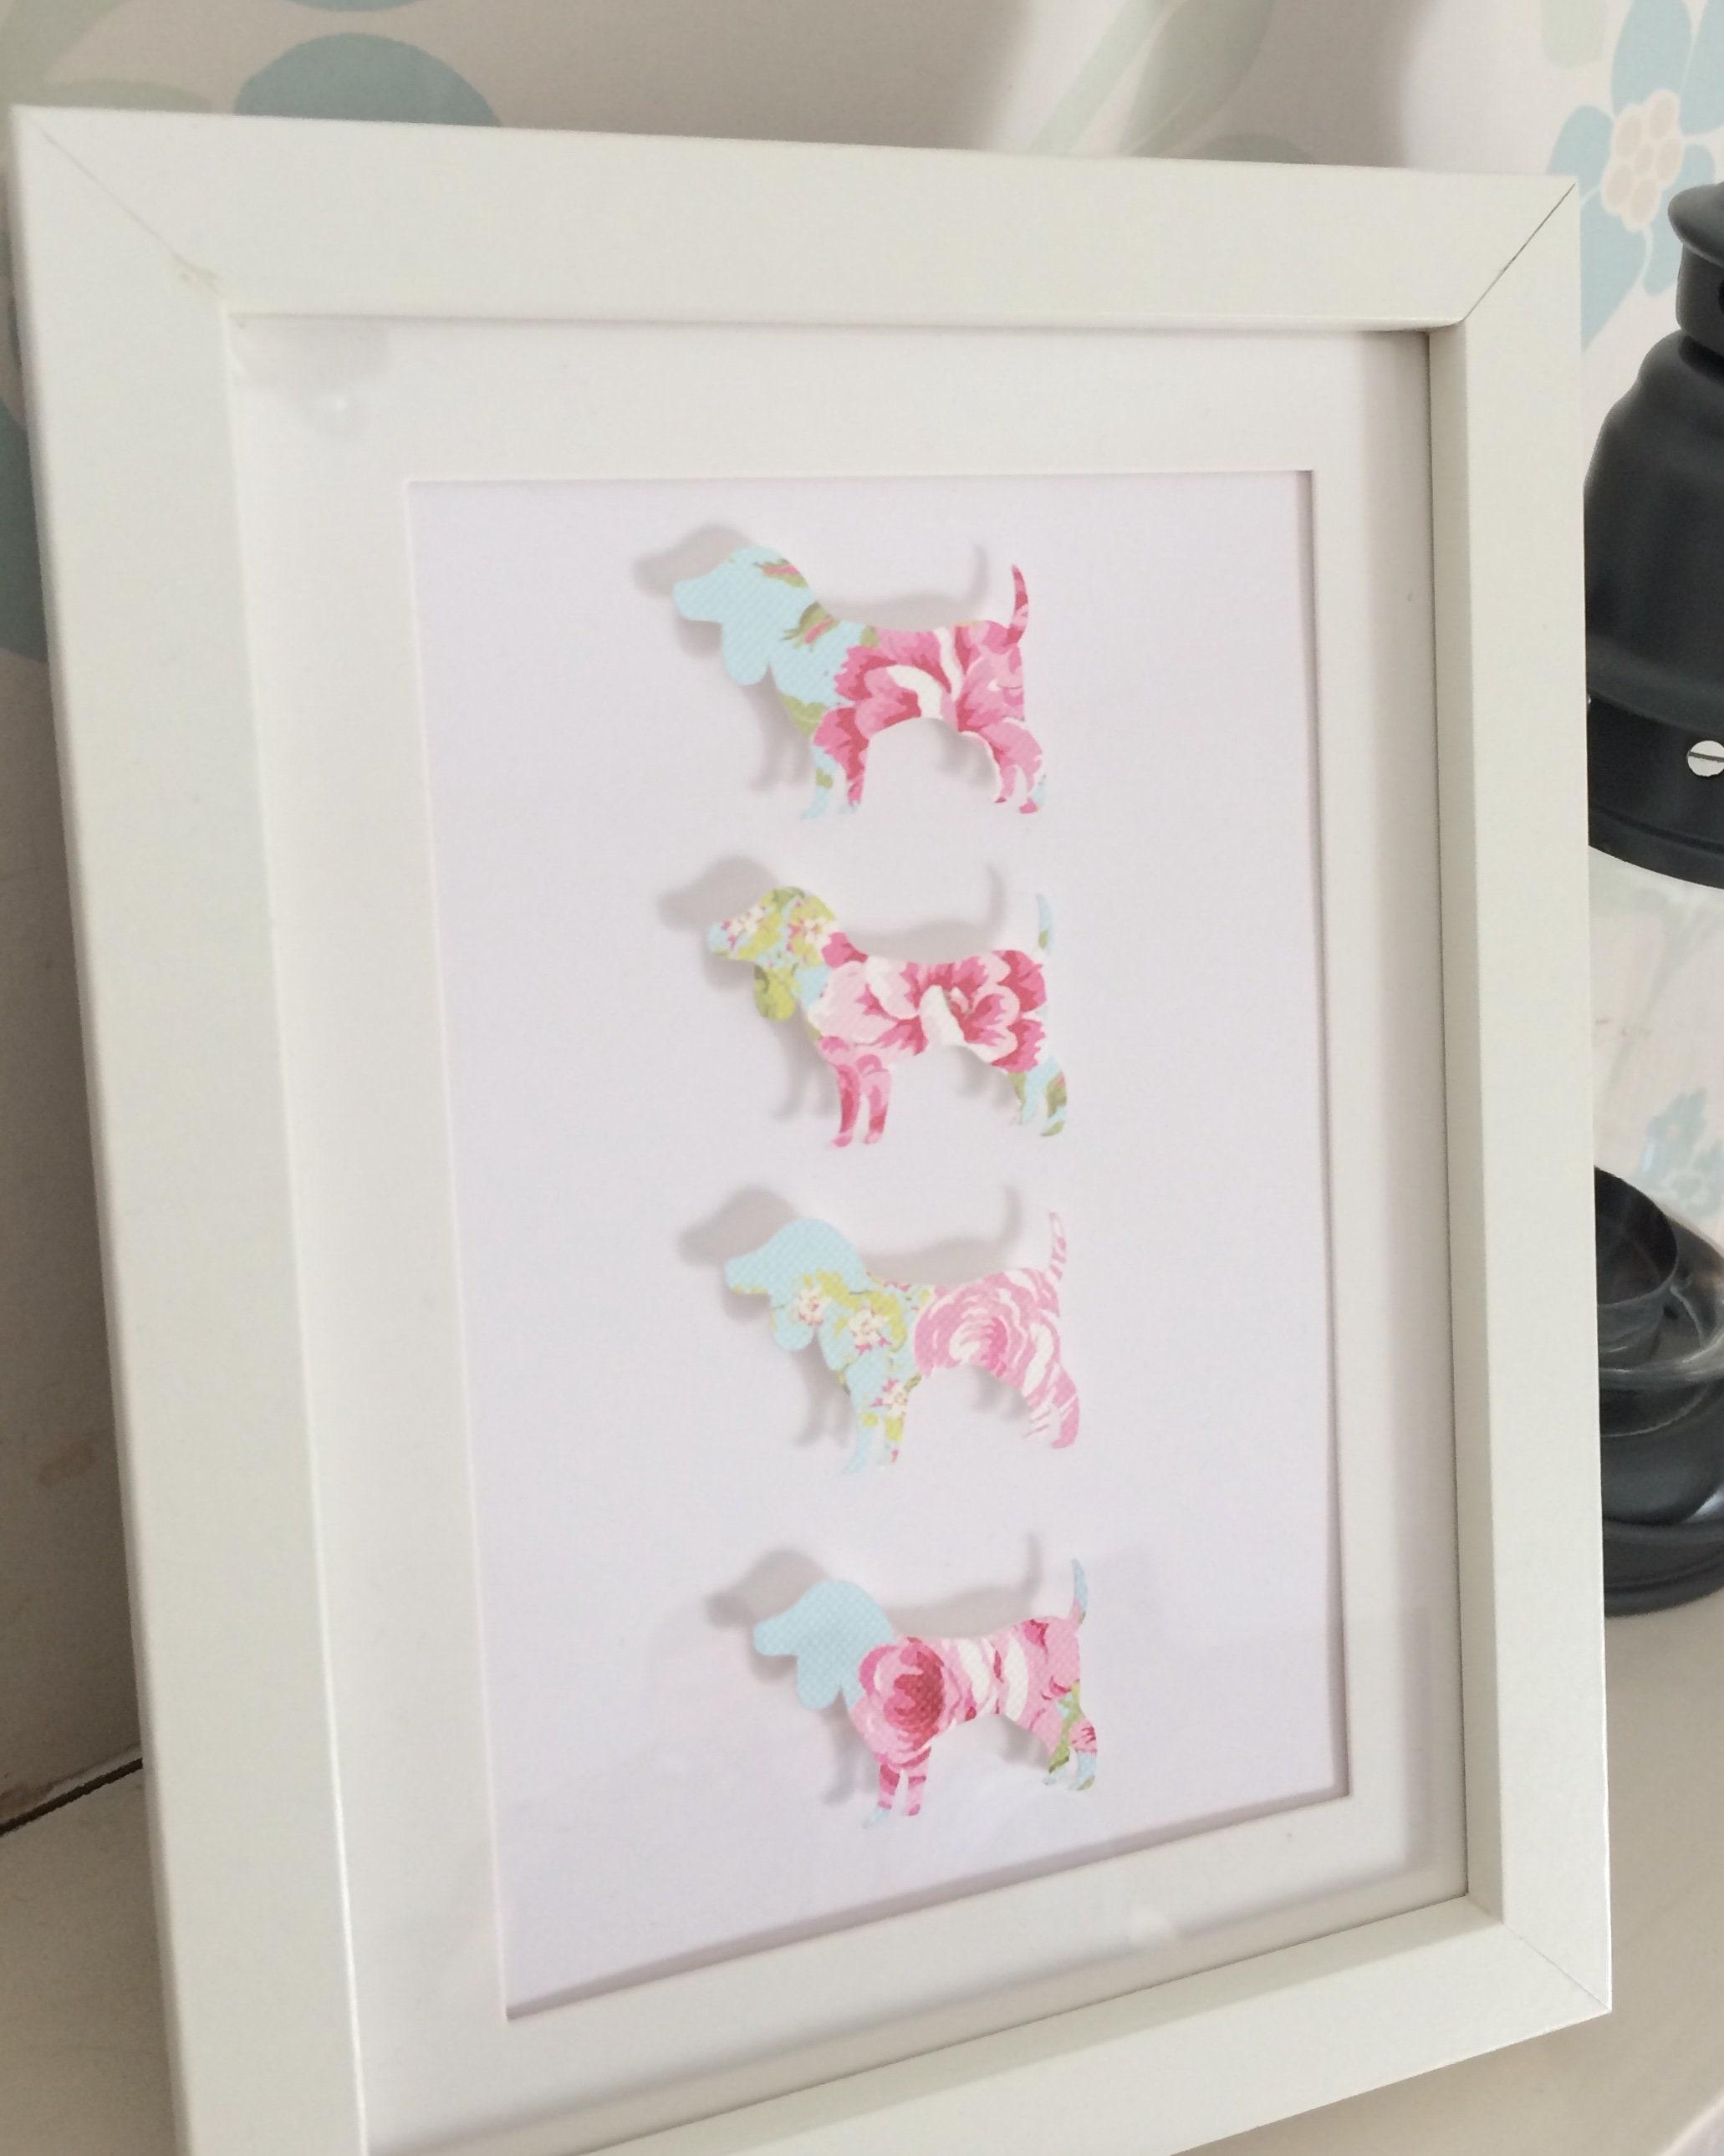 5 X 7 floral dog design frame wall art paper cut